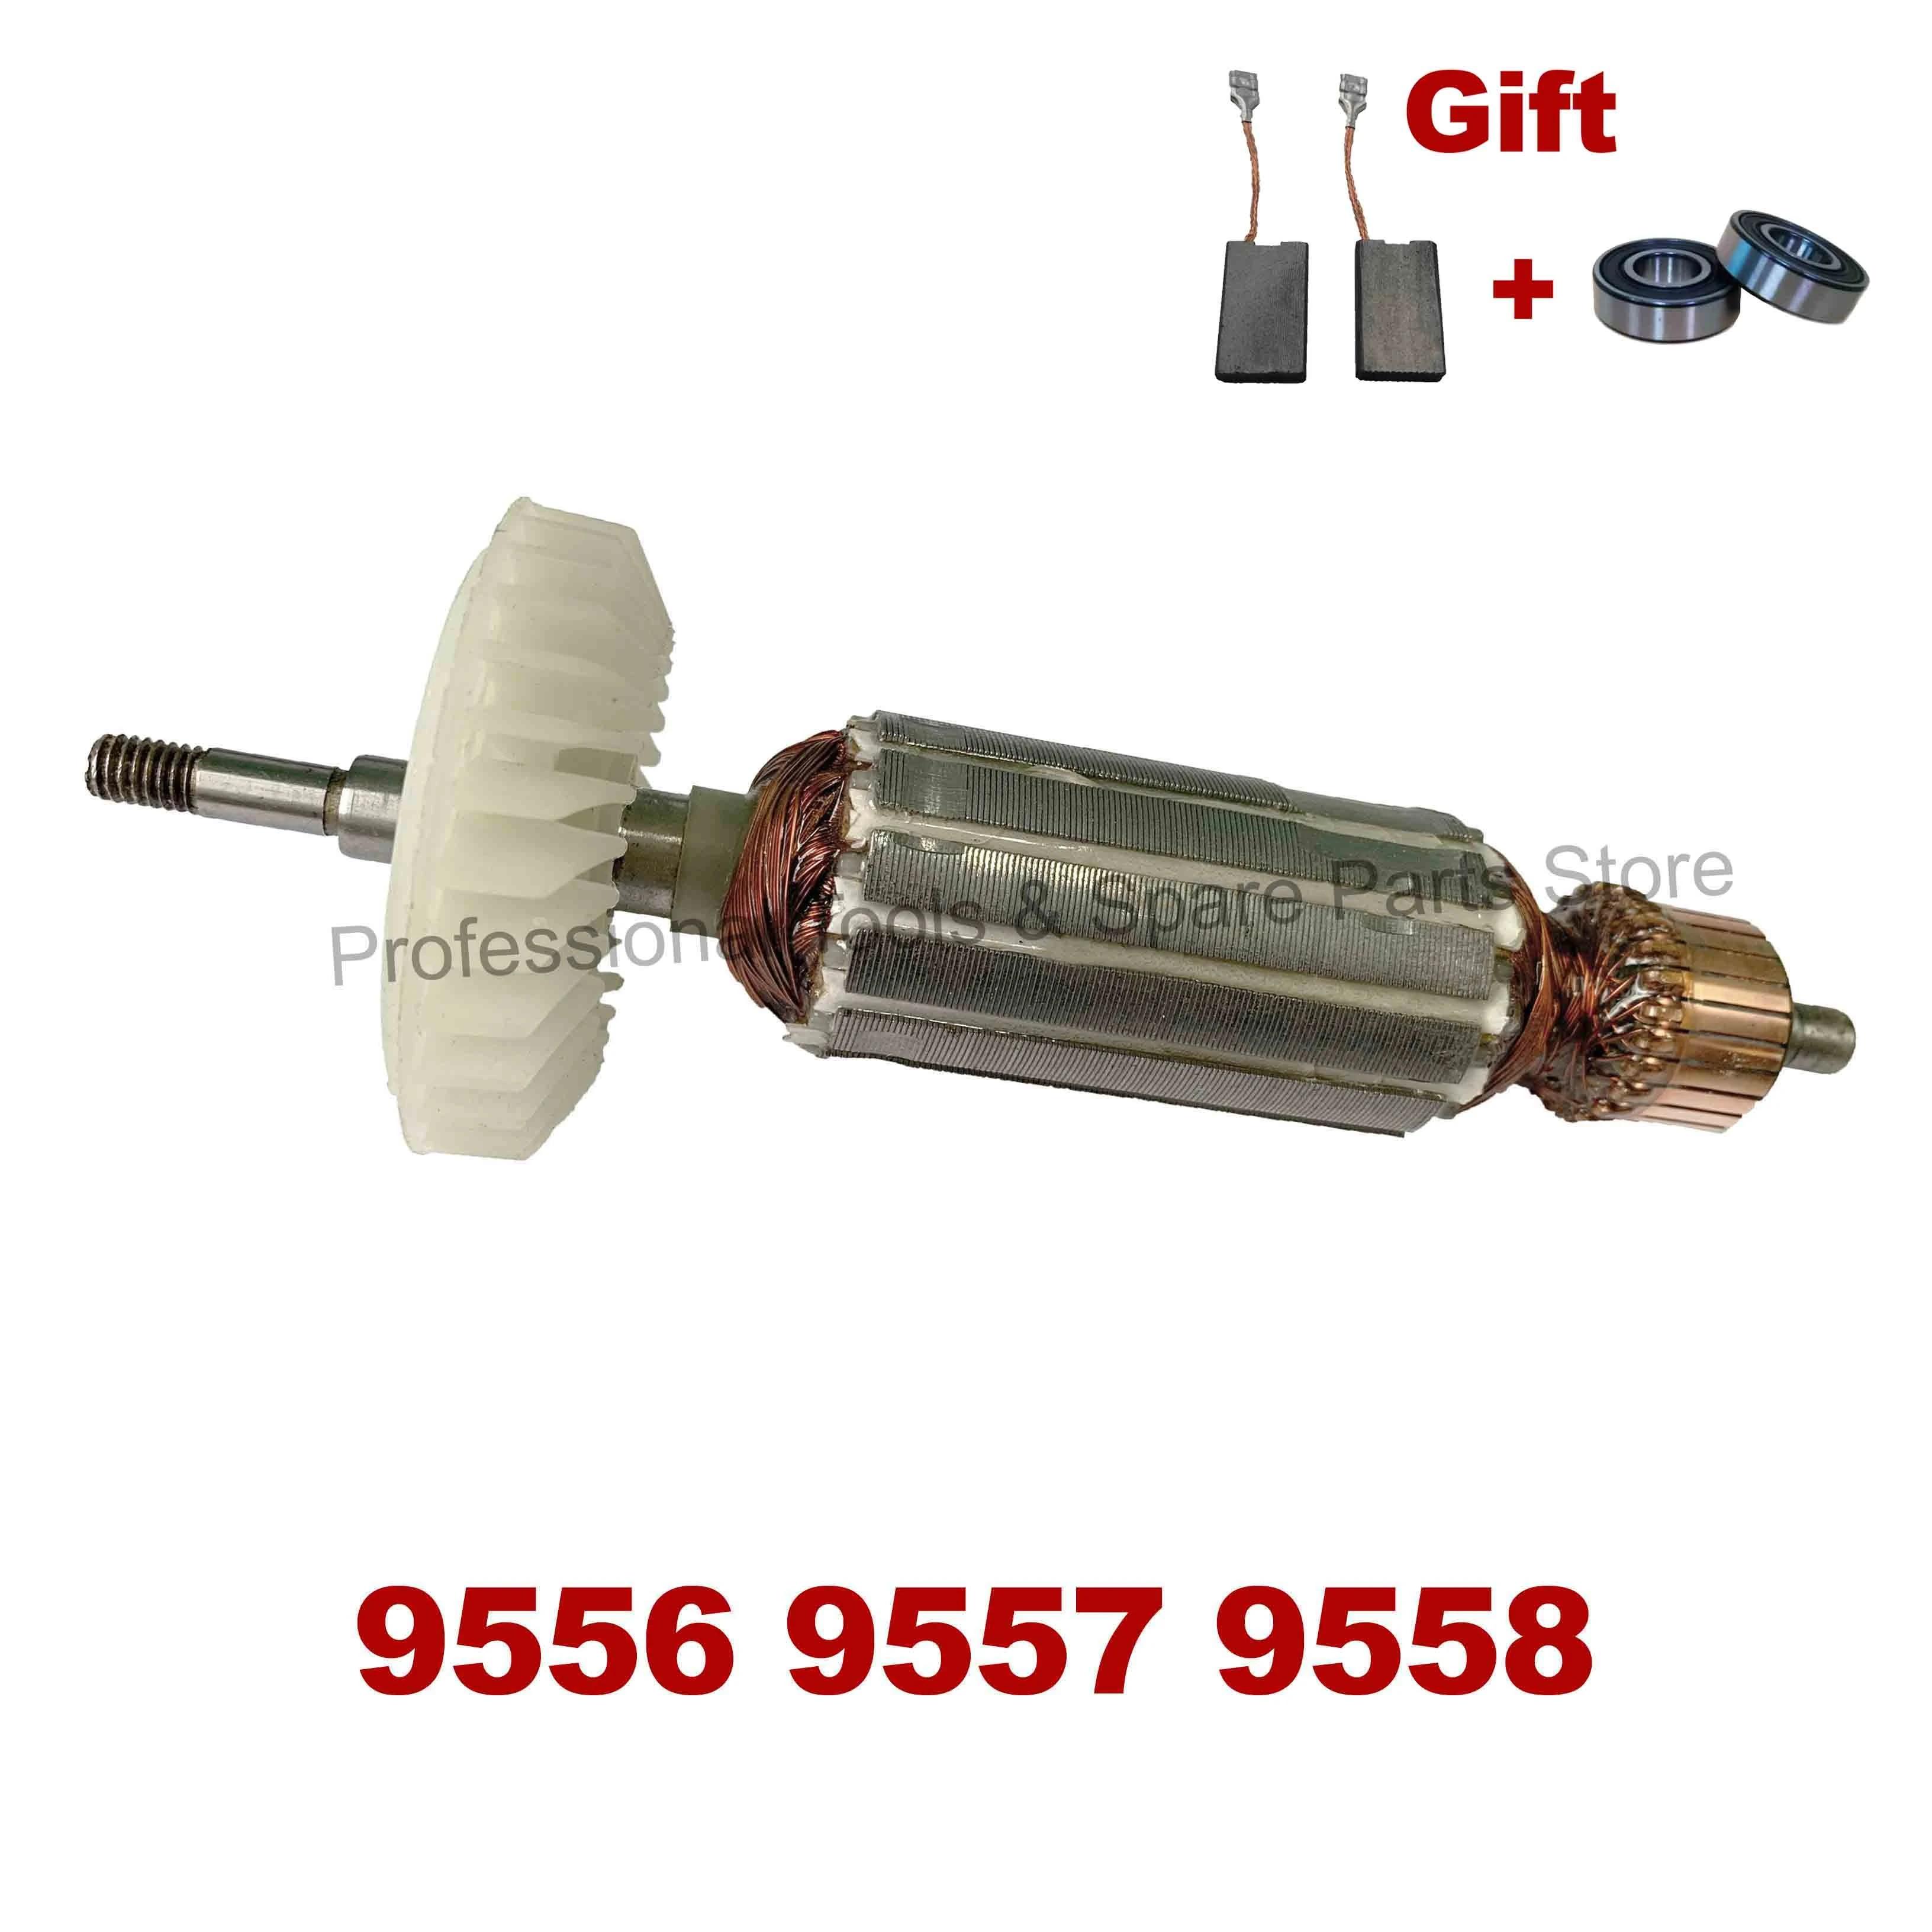 Armature Rotor 9556 9557 9558 9556NB 9556HN 9557NB New Durable High quality